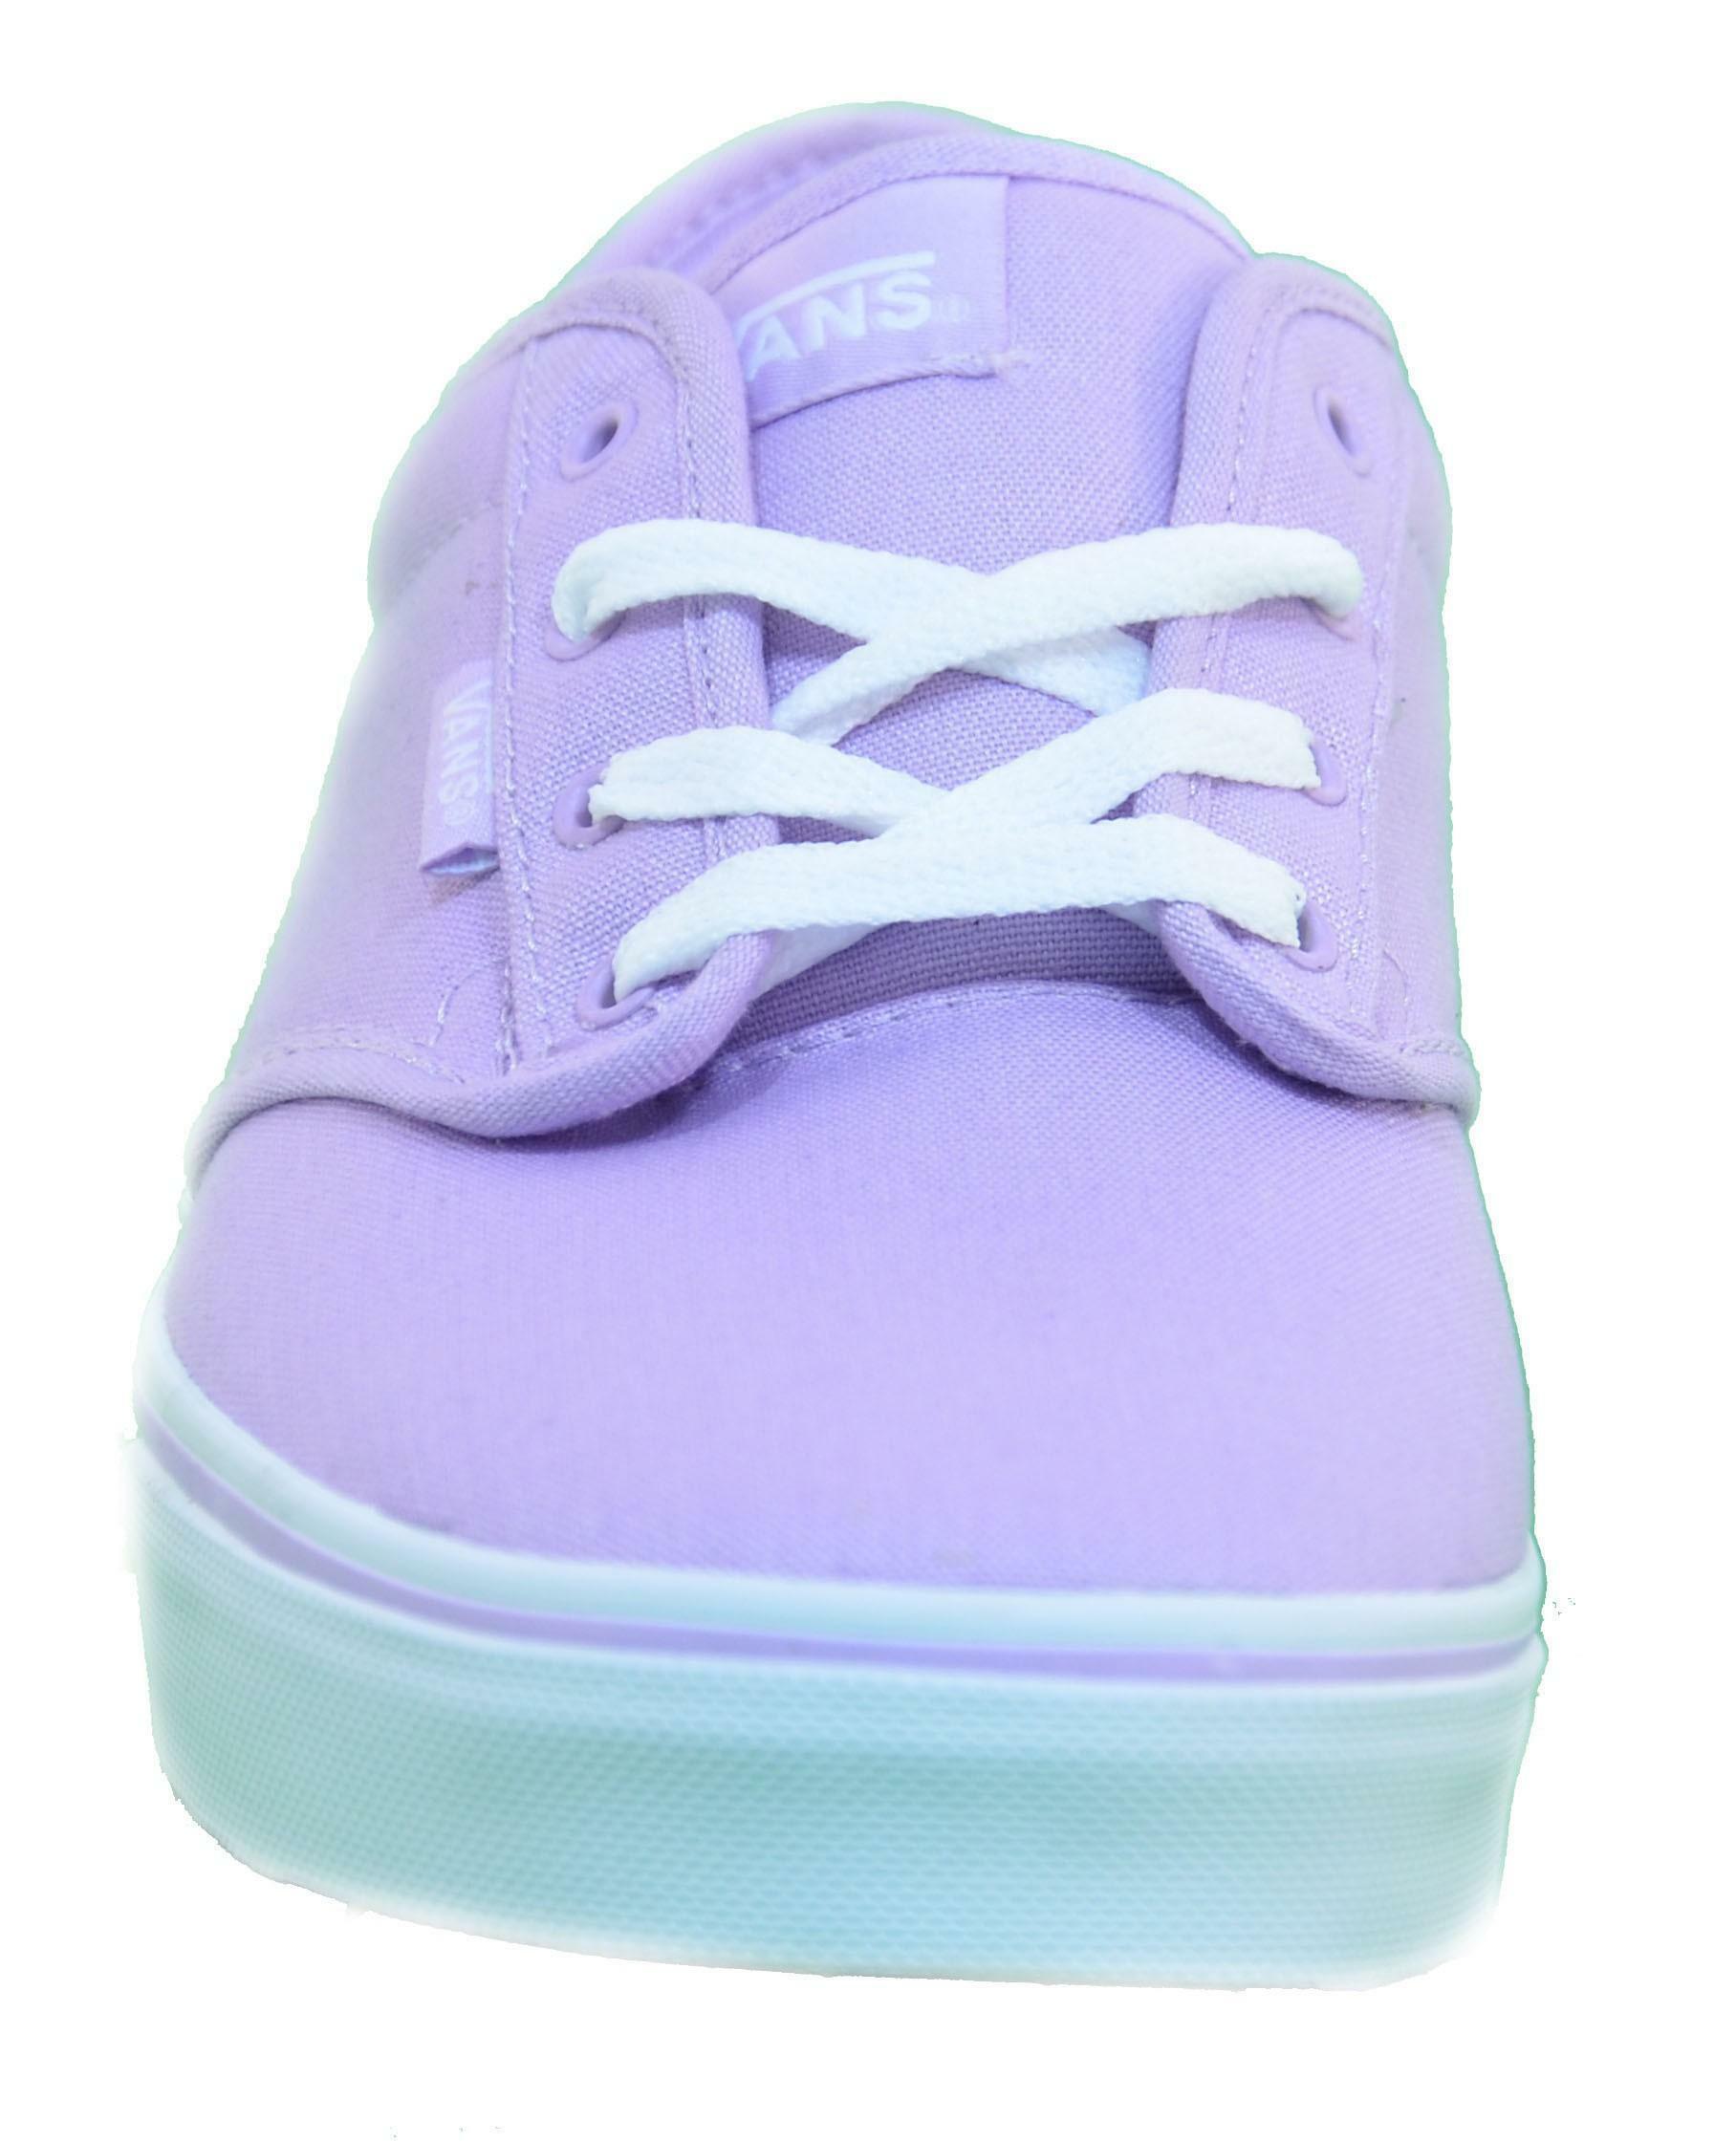 vans vans atwood scarpe donna viola tela zusf9h